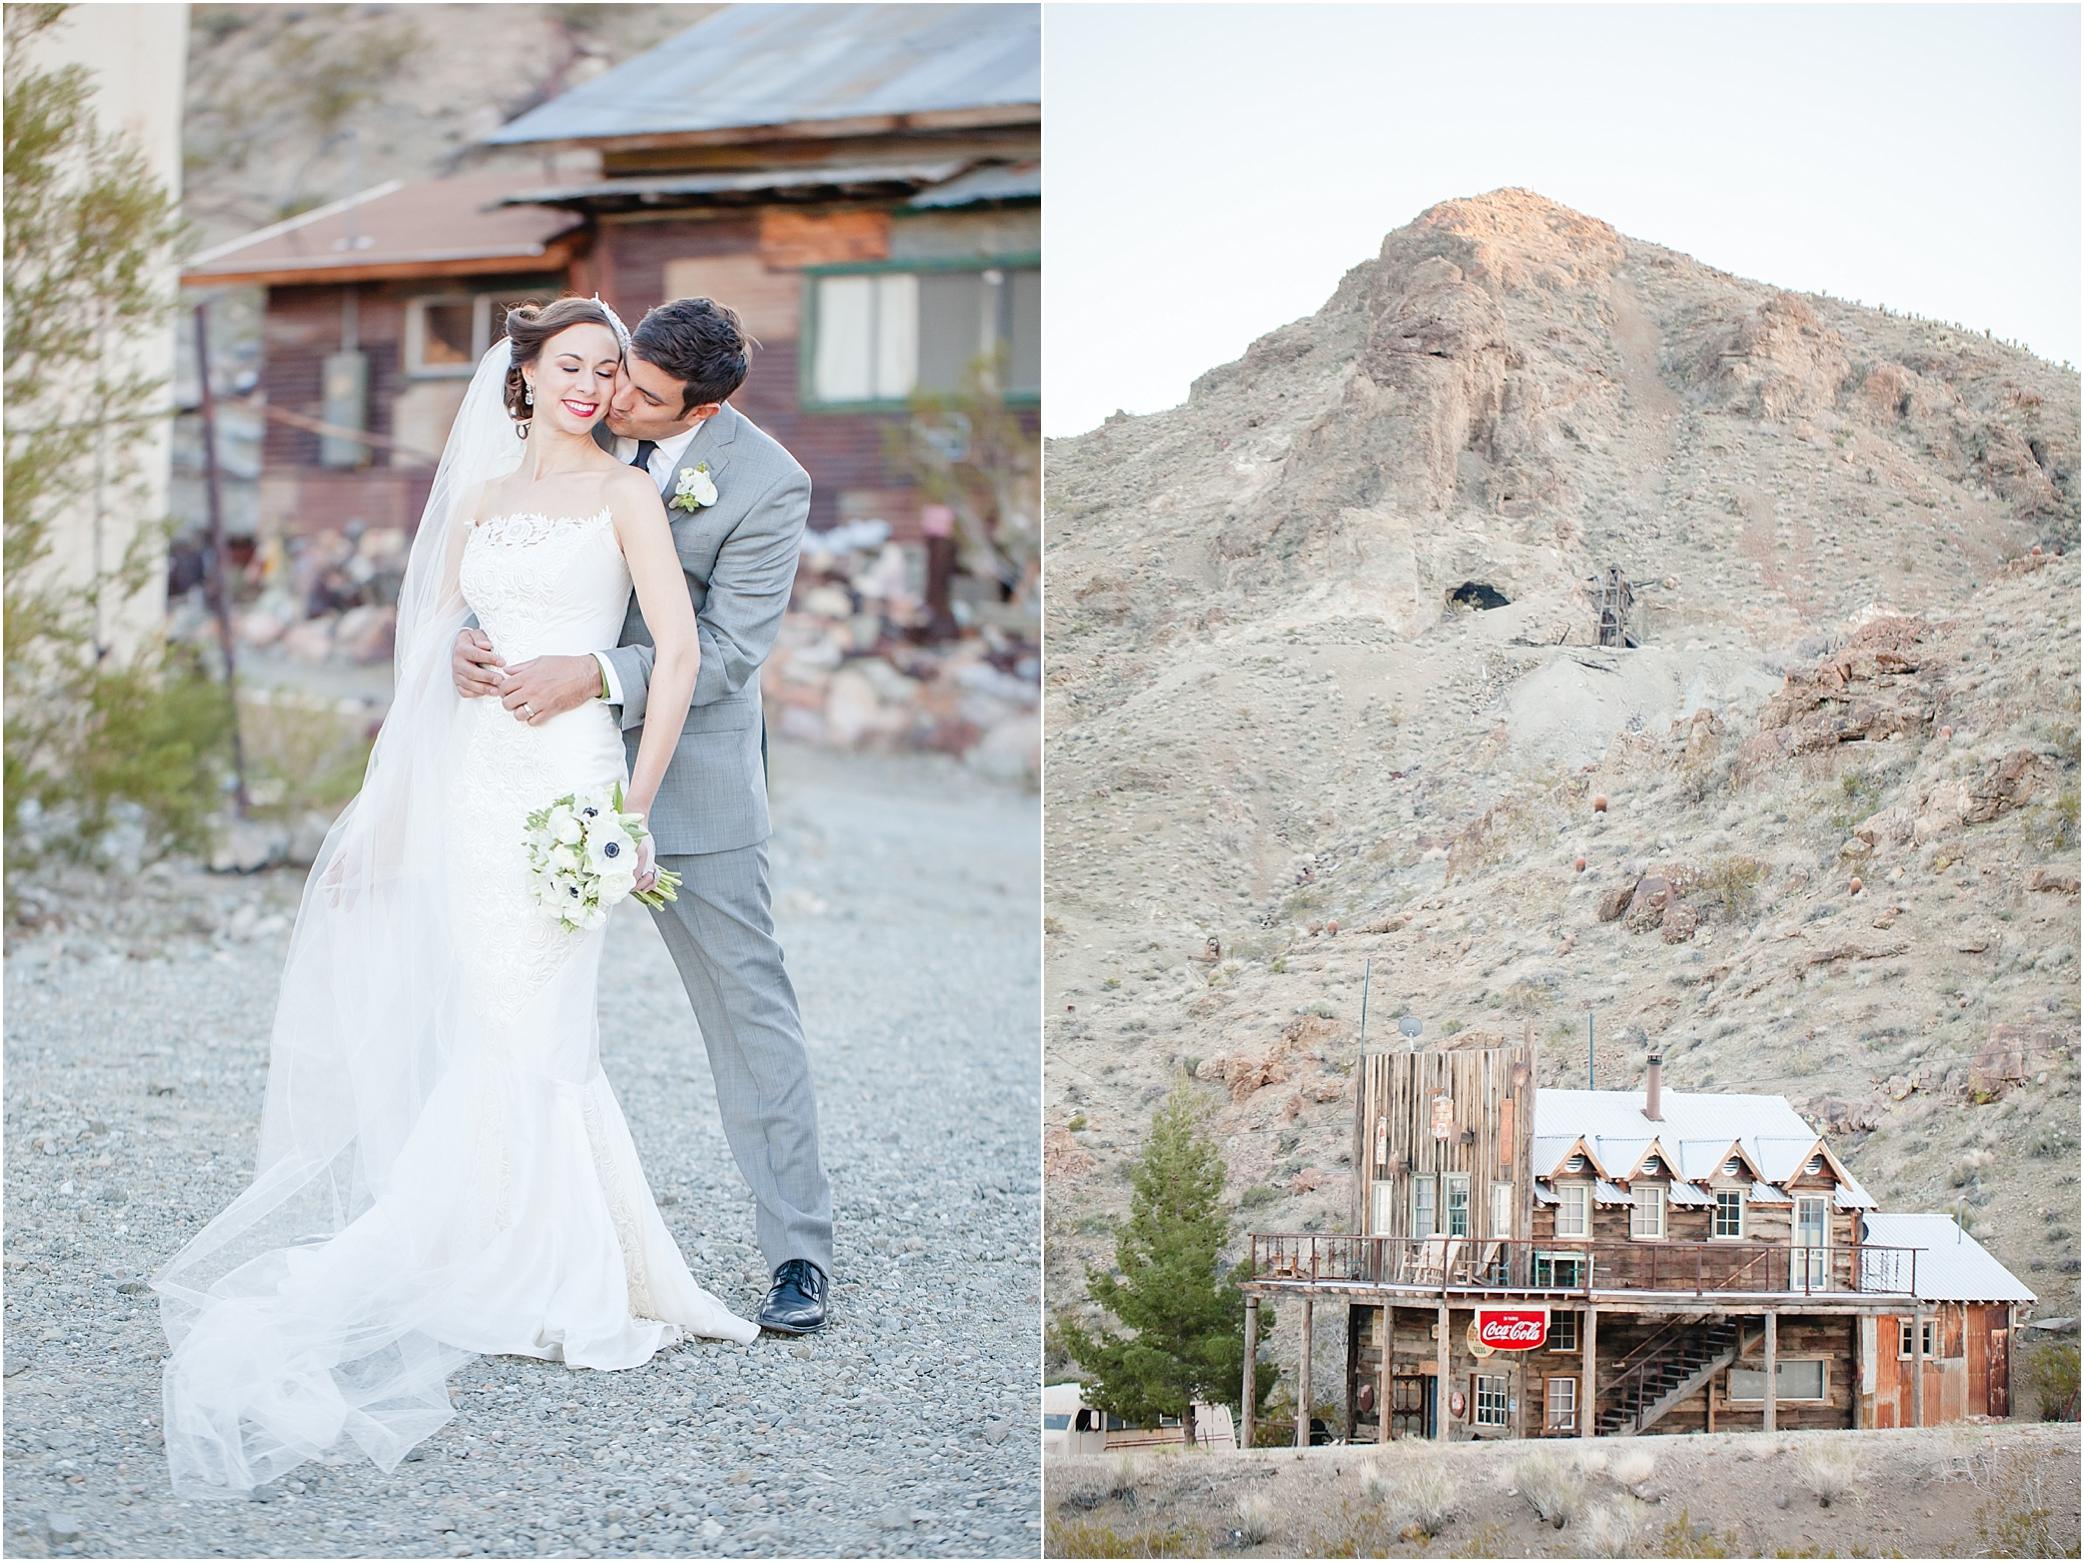 Knoxville Photographers Las Vegas Desert Wedding Photos